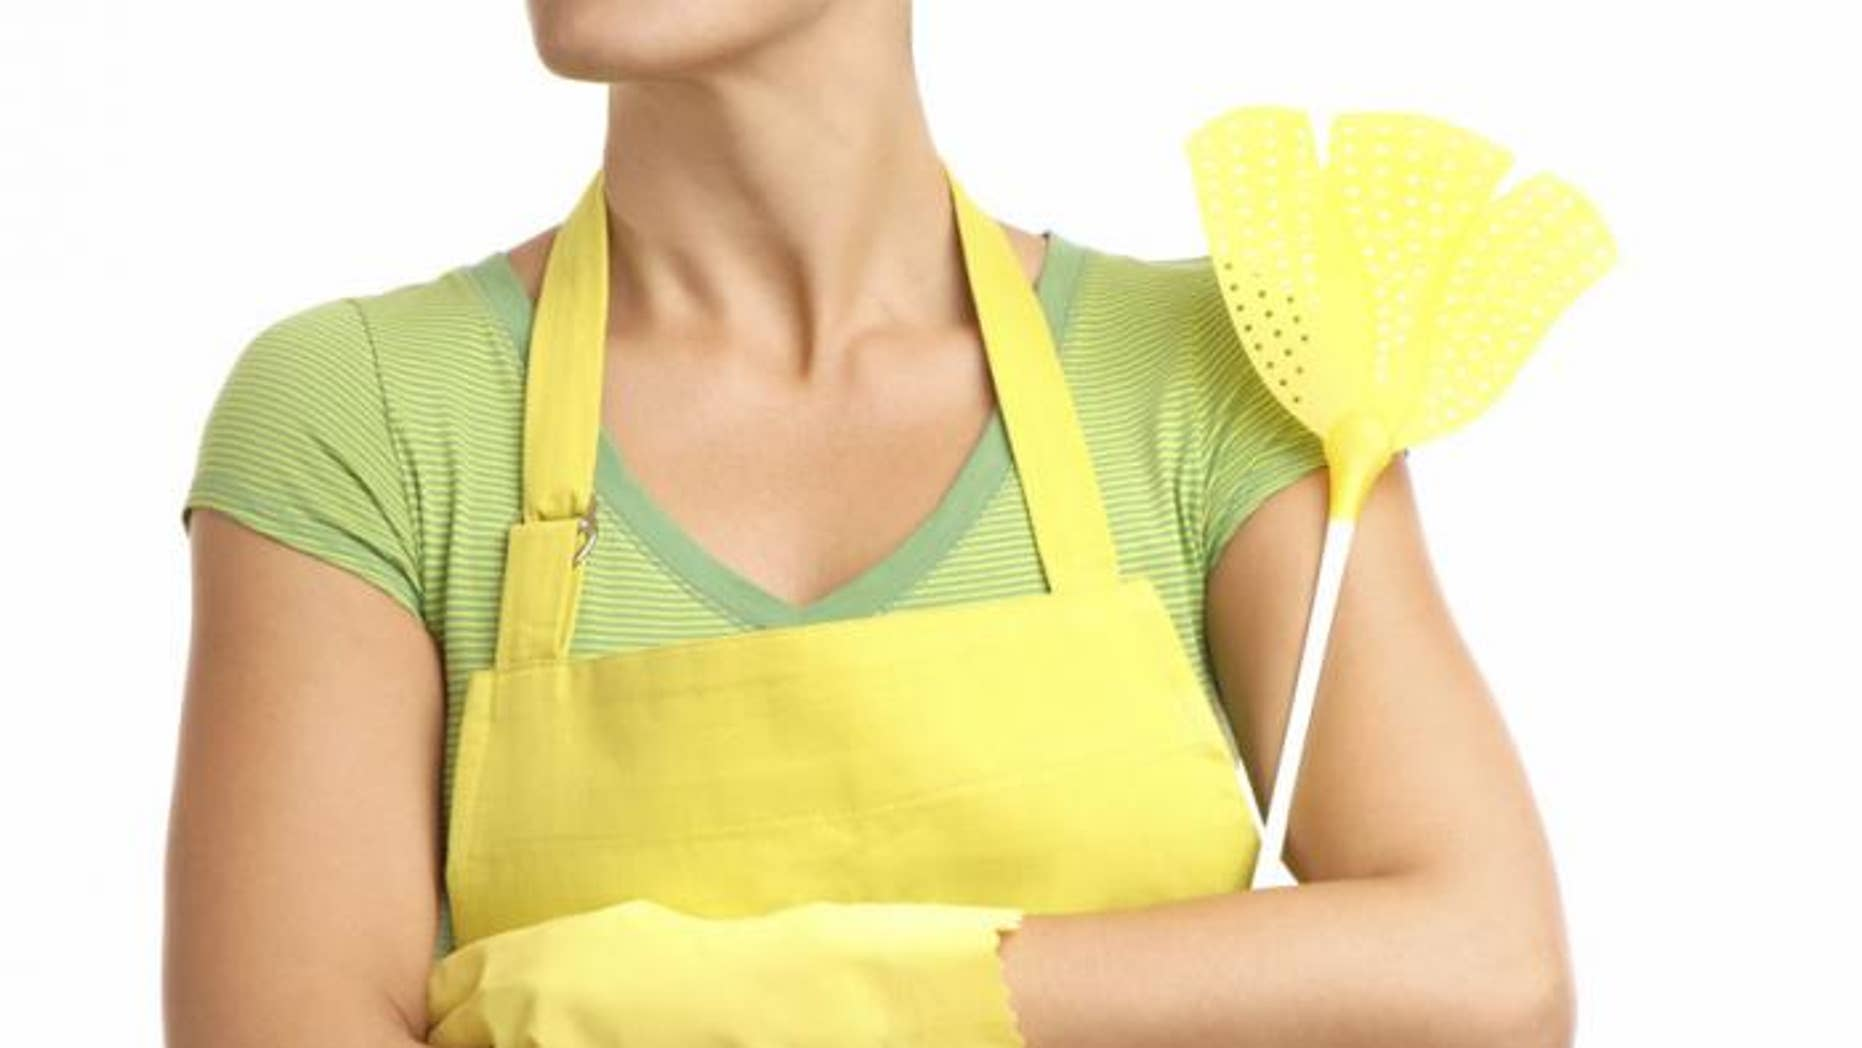 5 Easy Ways to Get Rid of Indoor Bugs | Fox News